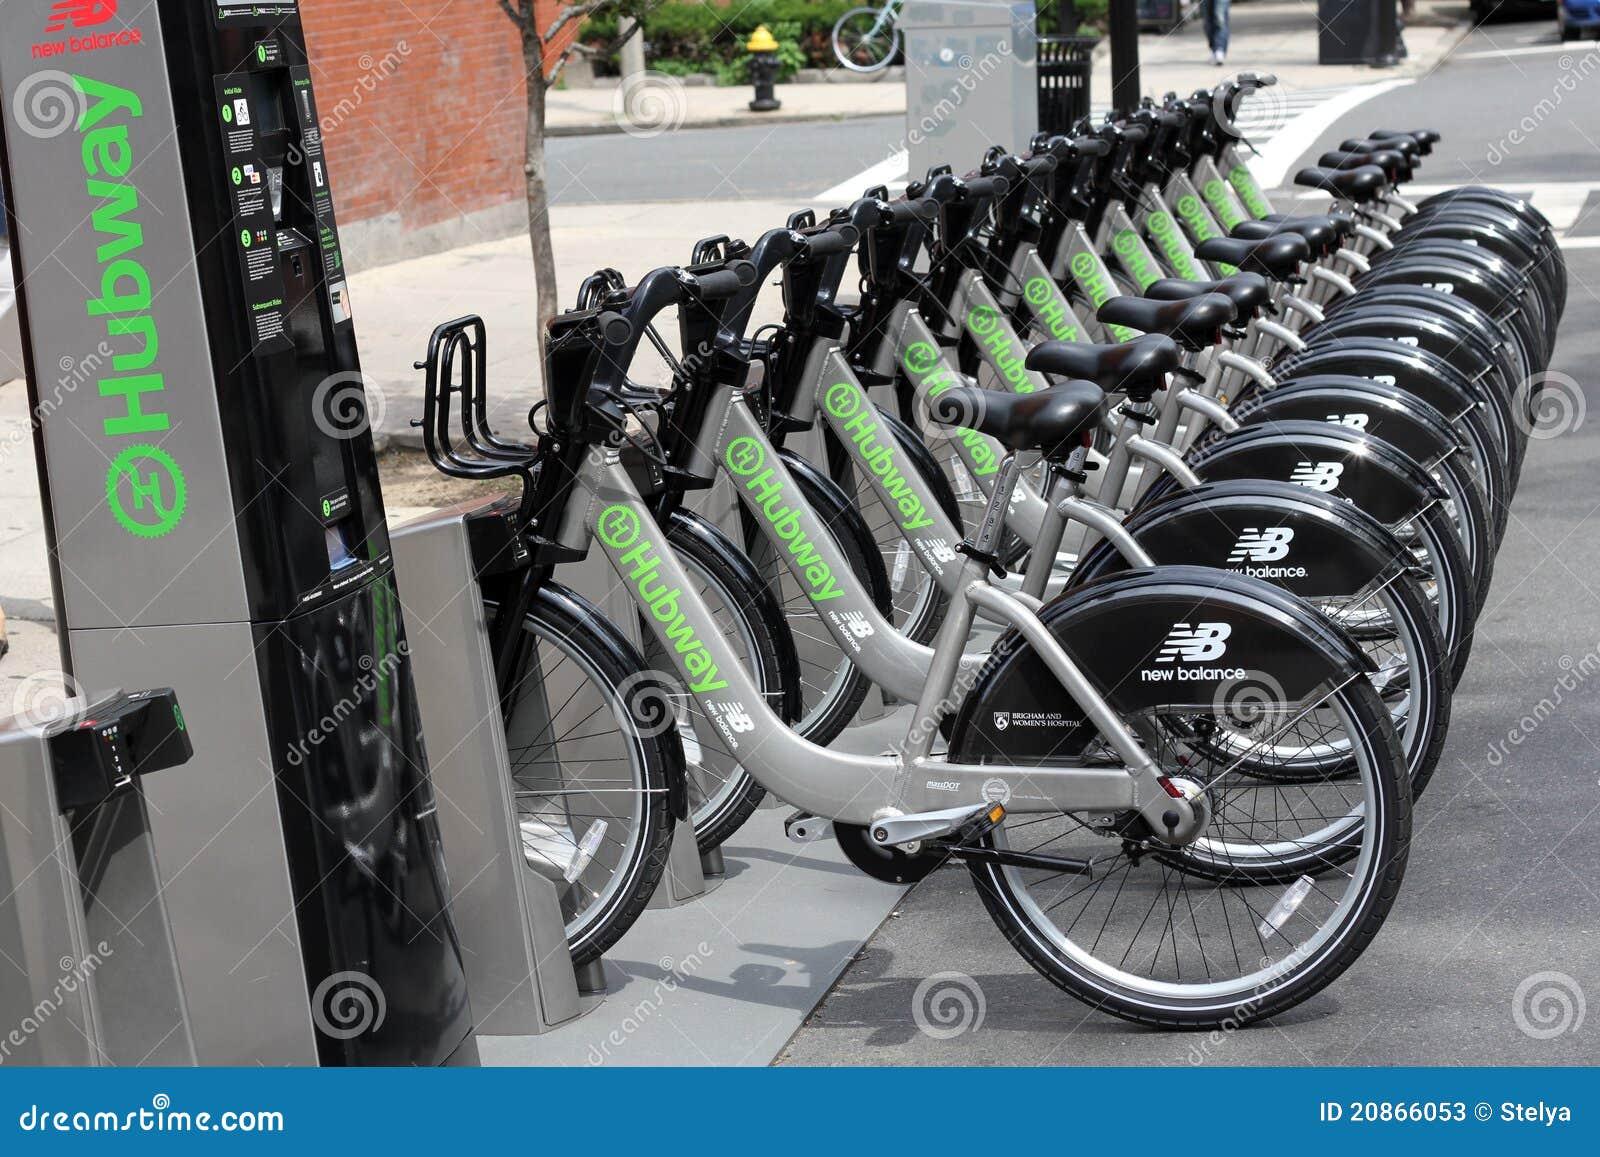 bike share rental station editorial stock photo image of